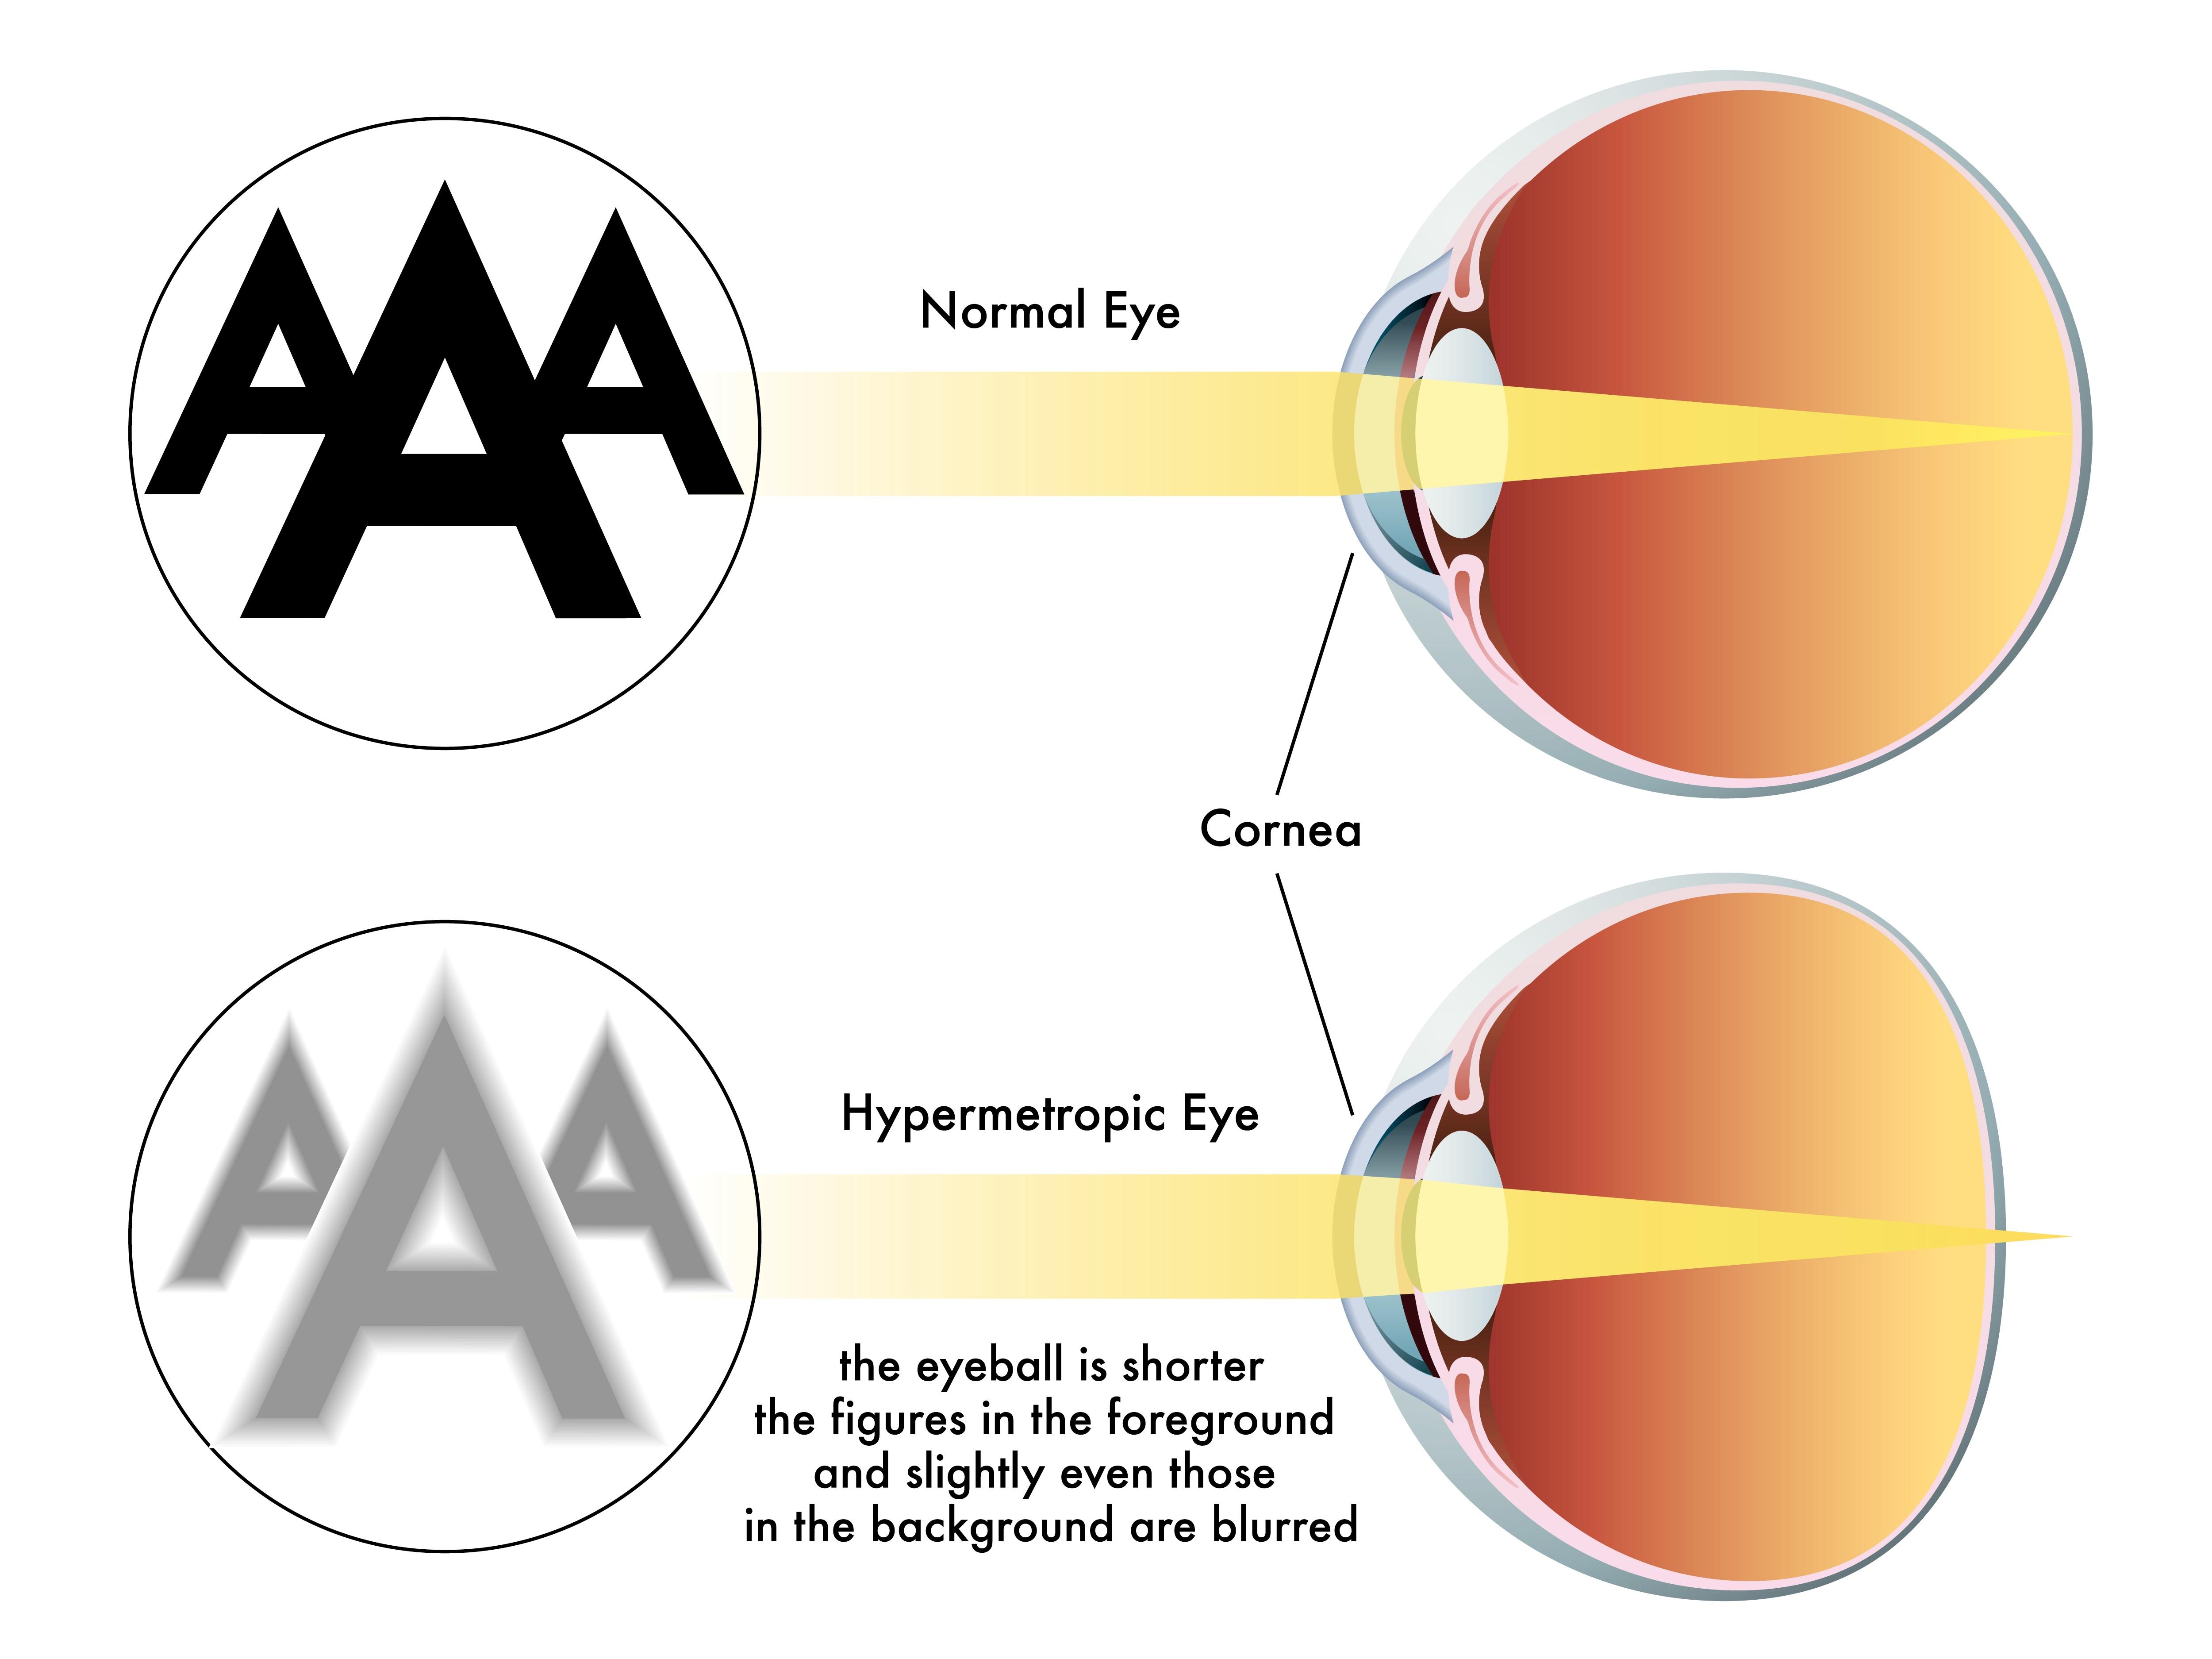 hipermetropia durerea ochilor